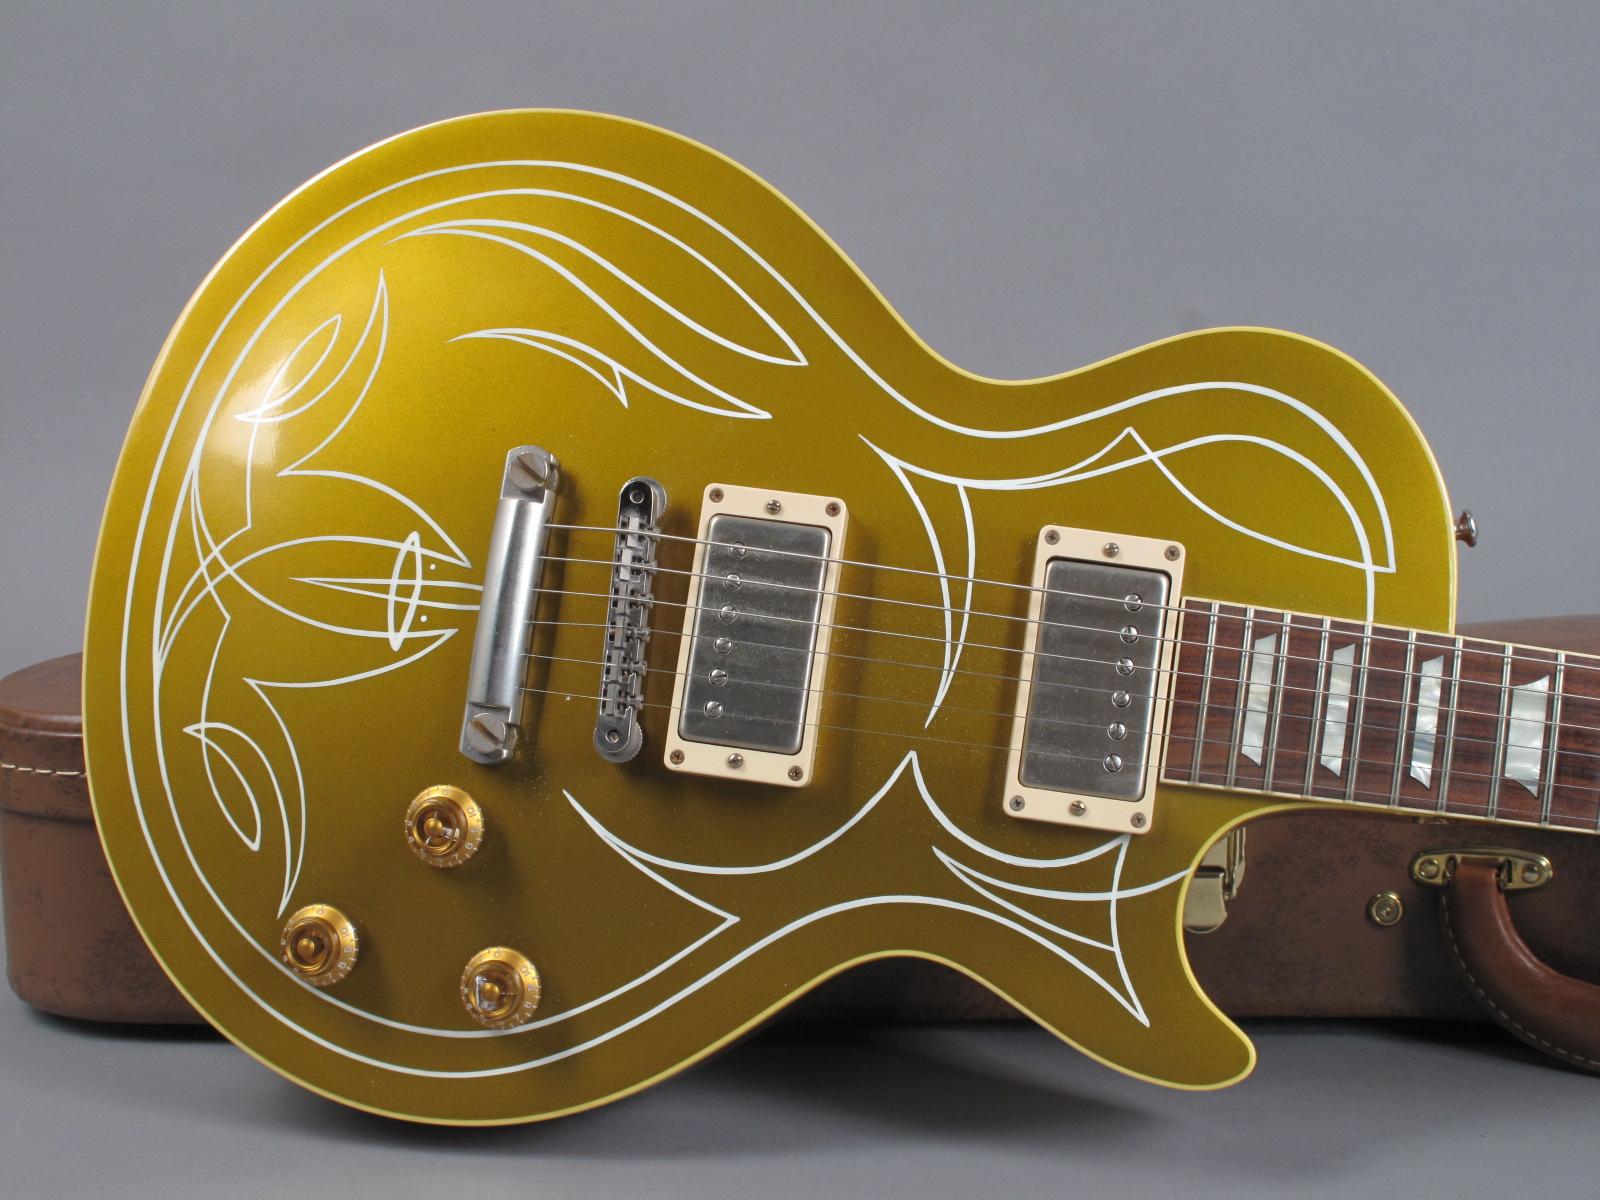 https://guitarpoint.de/app/uploads/products/2014-gibson-les-paul-billy-gibbons-goldtop-pinstripe/2014-Gibson-Les-Paul-Billy-Gibbons-1957-Goldtop-Pinstripe-Vos-BGGT060-9.jpg